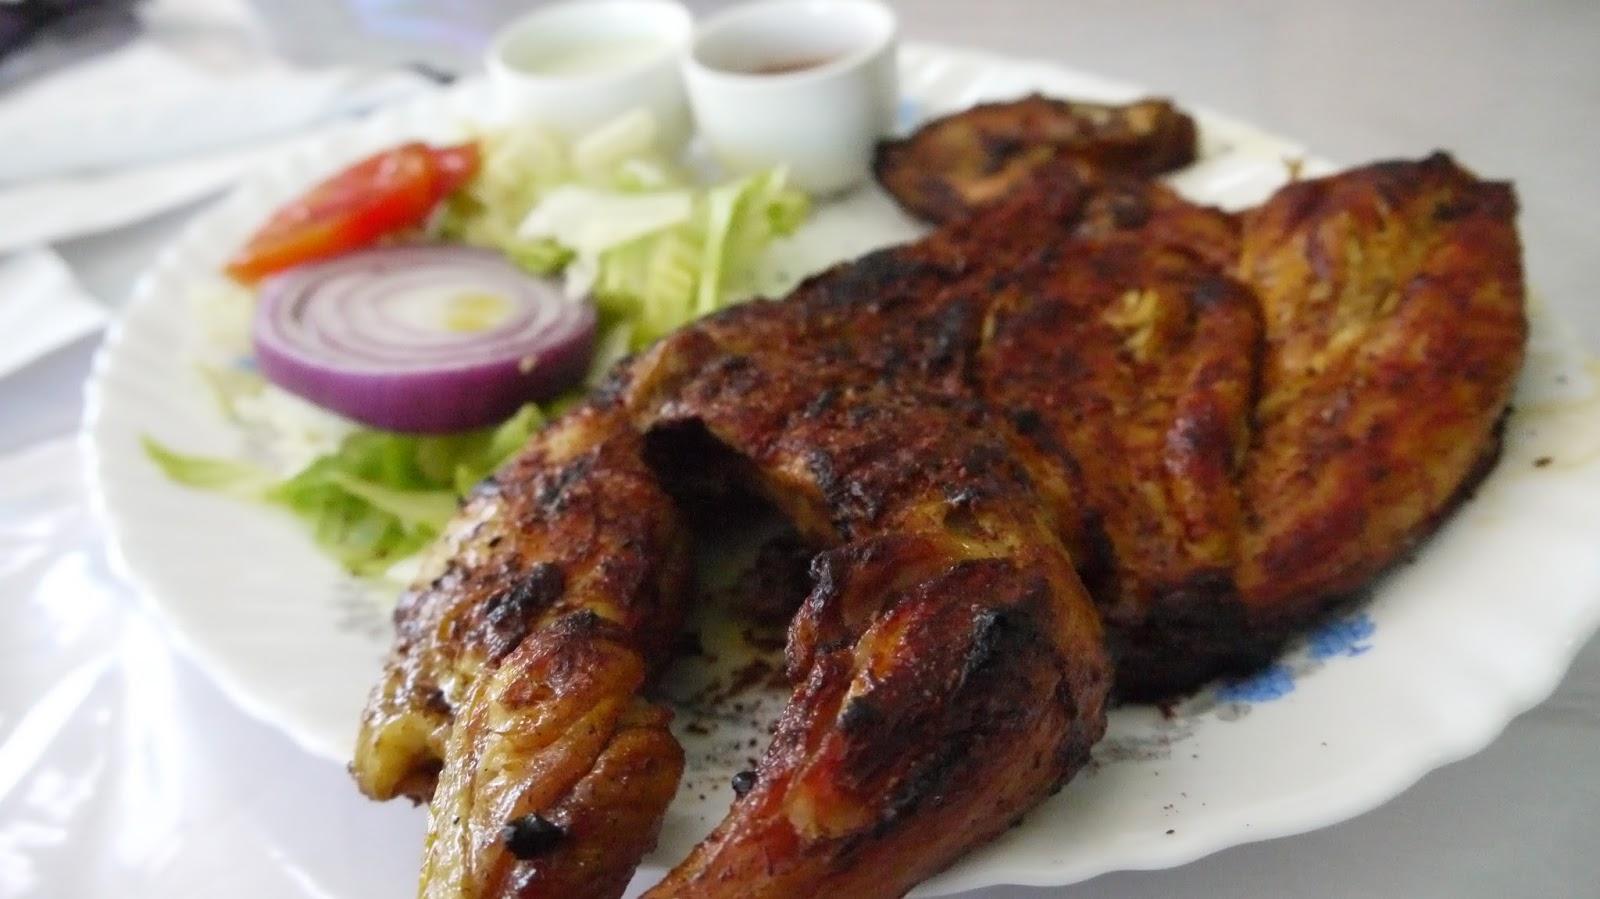 Turkish, Kabab, Kebab, Meat, Adelaide, SA, Lawash, Thebarton, Charcoal, Grill, BBQ,